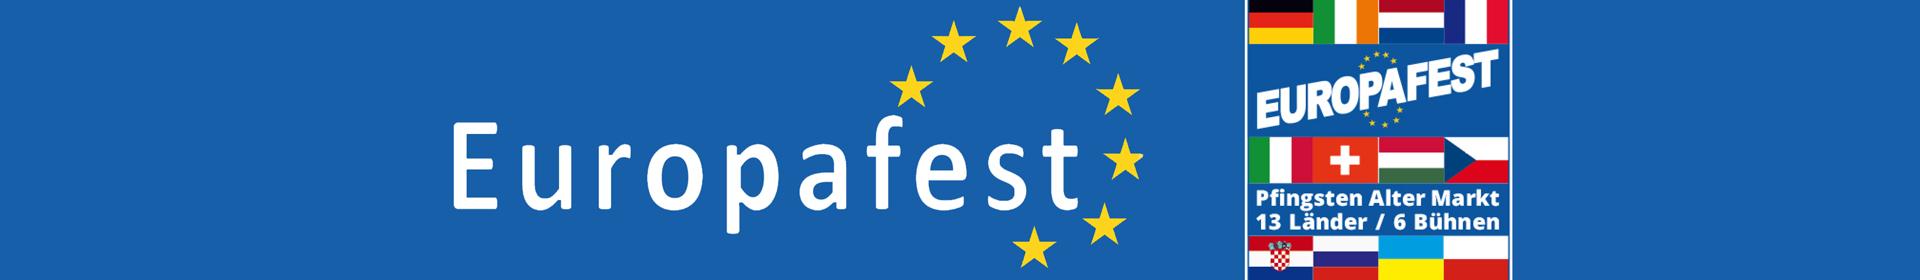 europafest-banner2_web